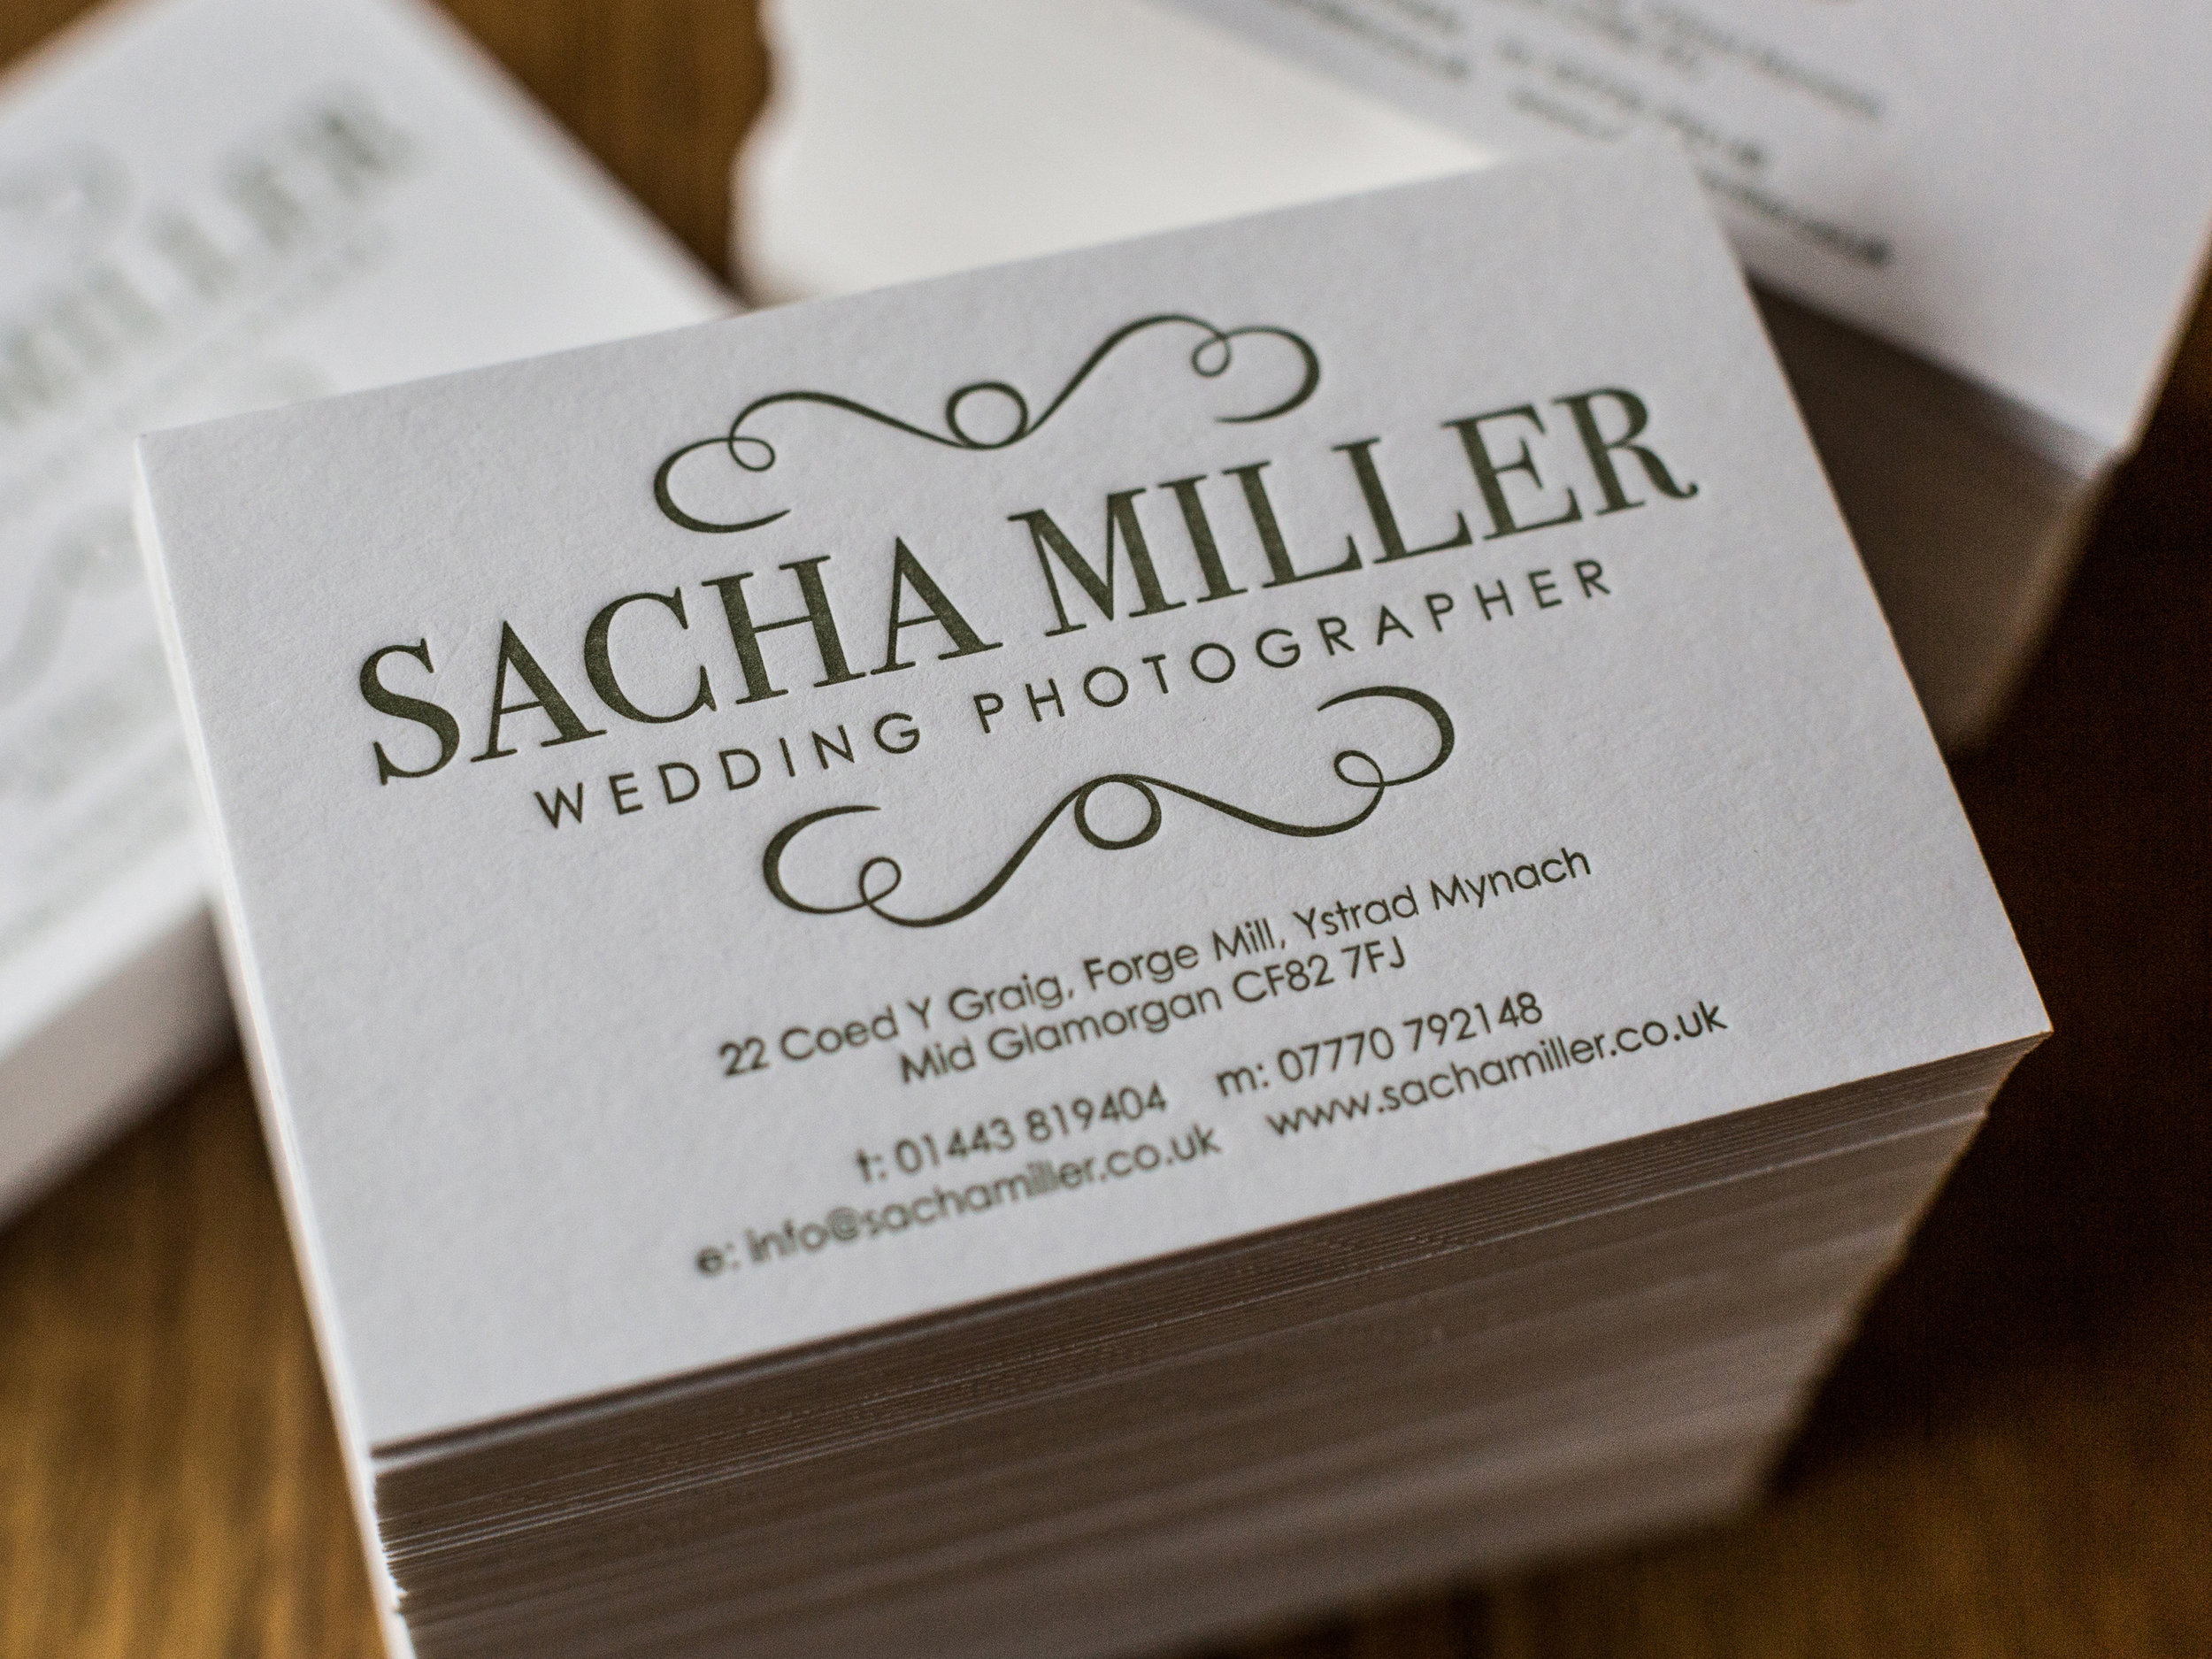 Sacha Miller